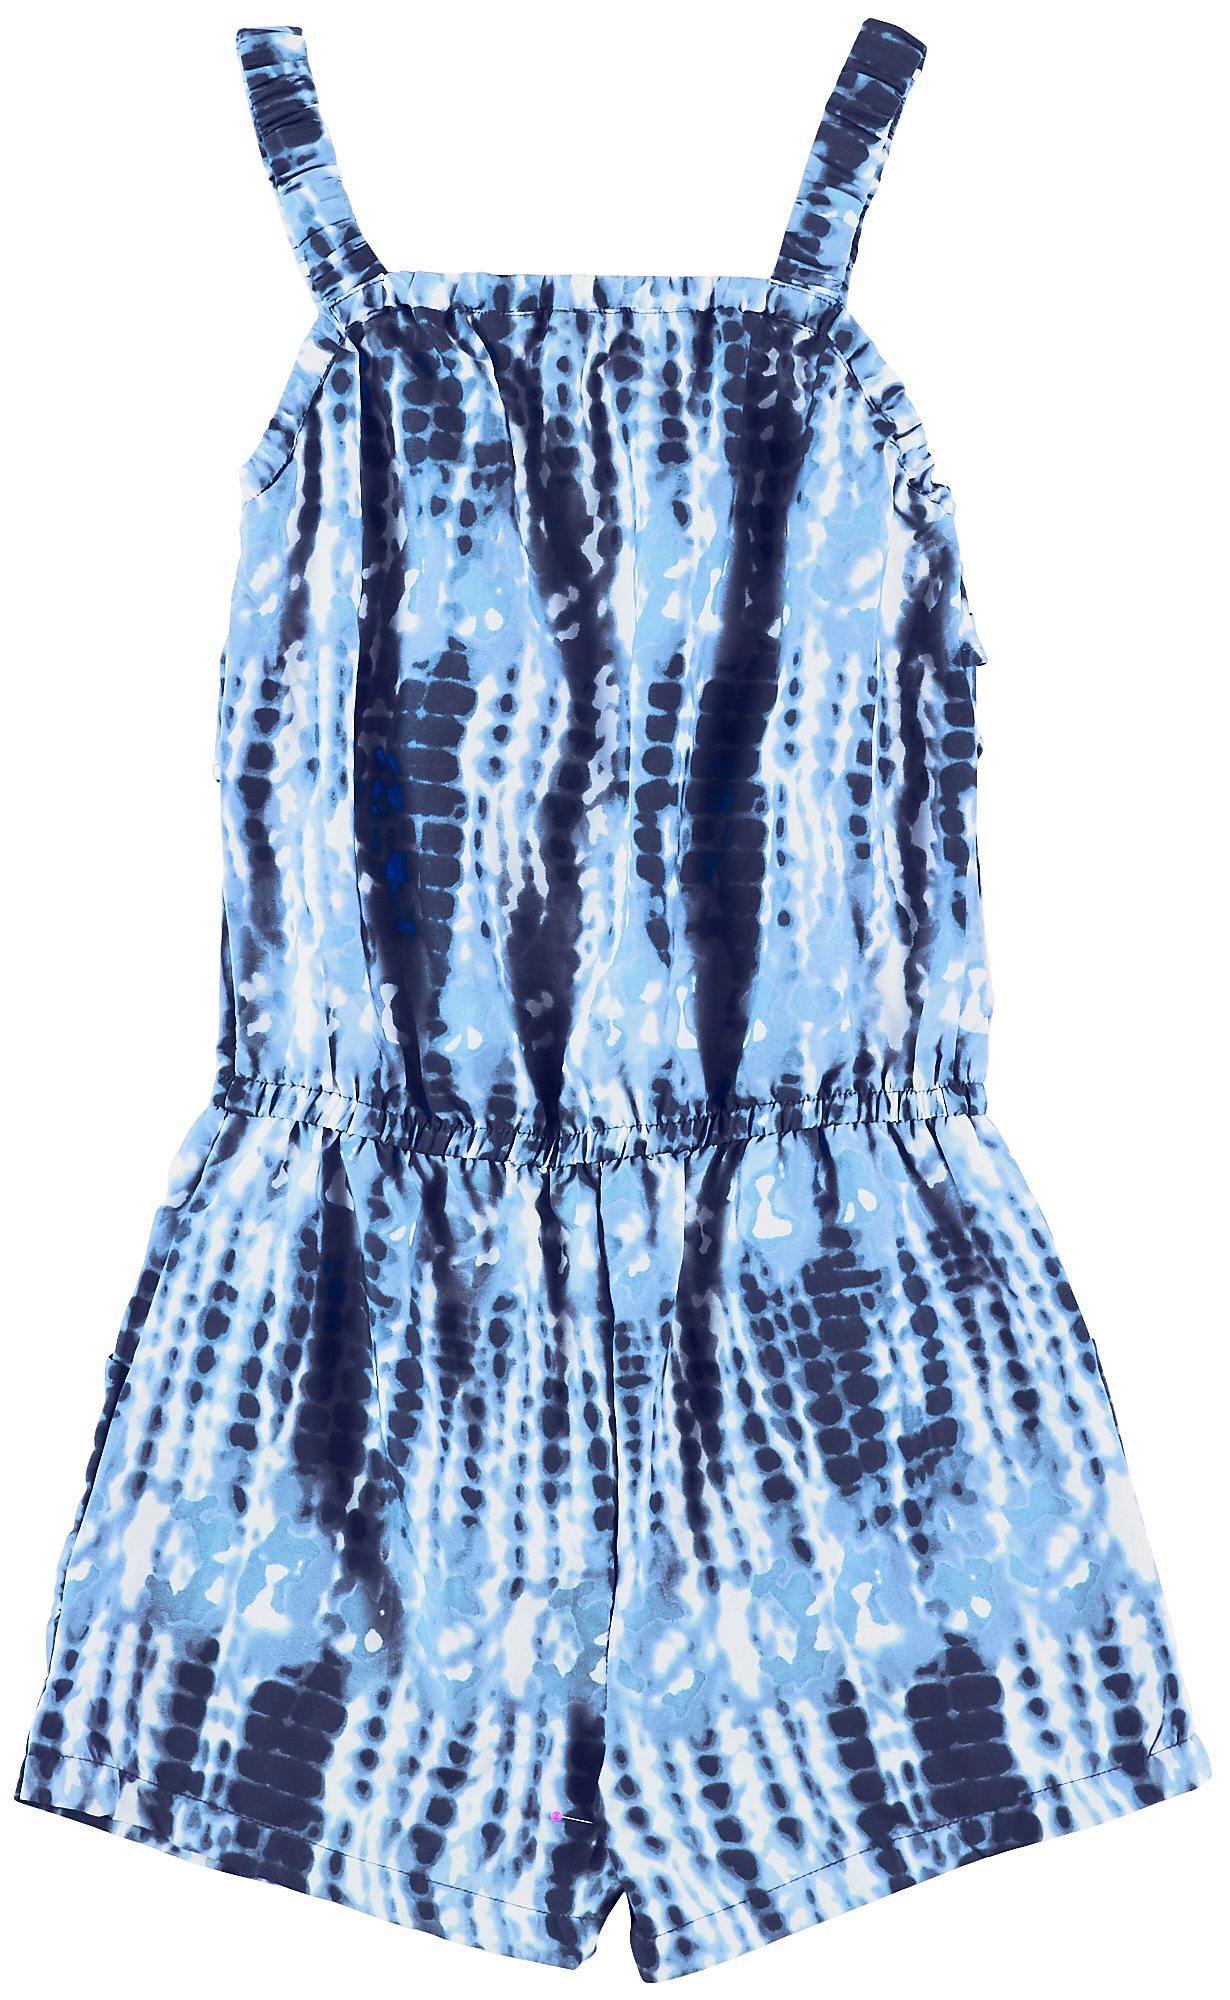 08d7c77c411 Wallflower Big Girls Tie Dye Ruffle Sleeveless Romper